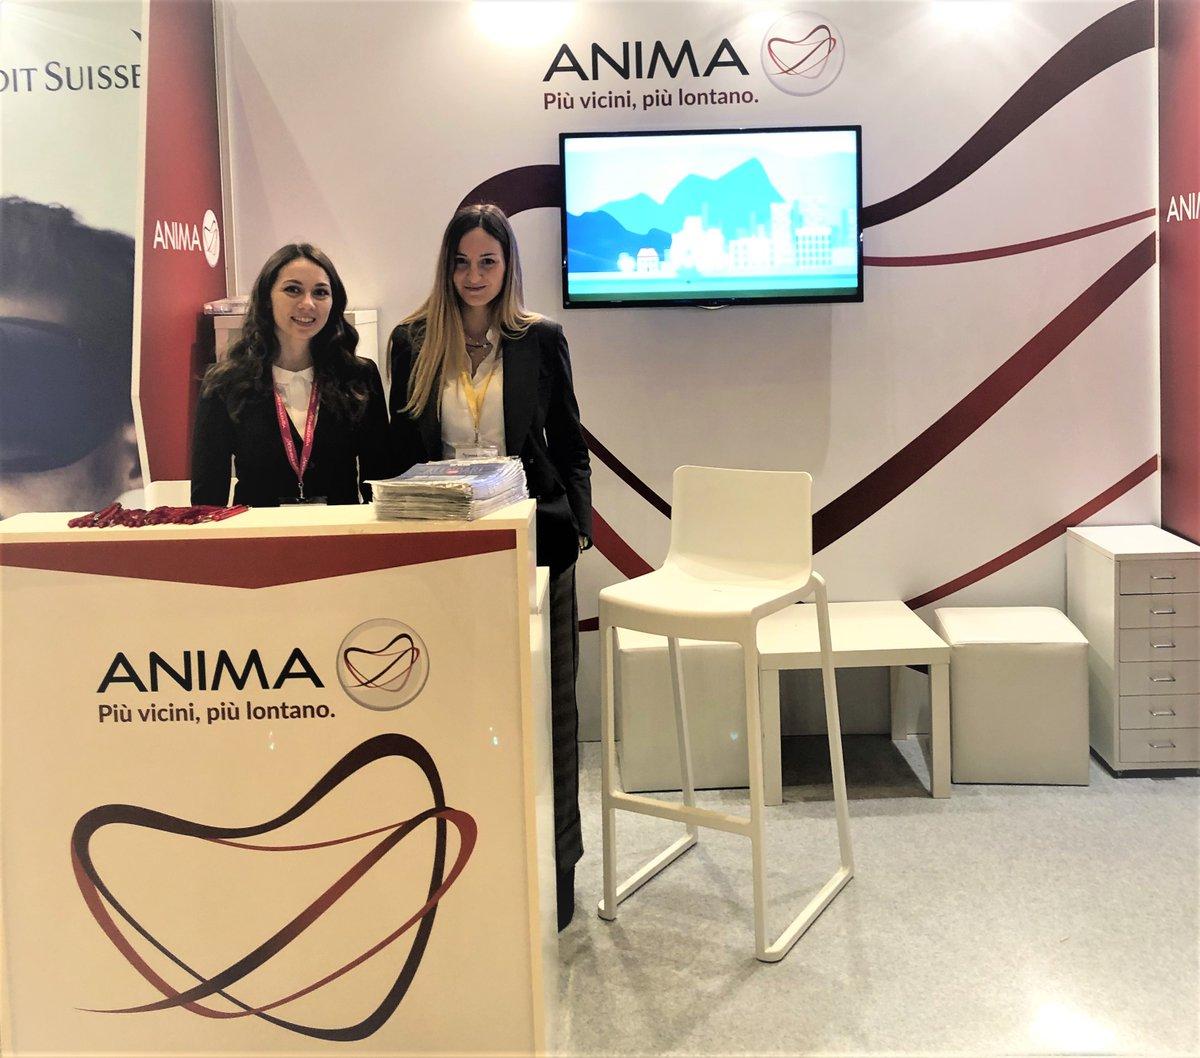 ANIMA_Sgr photo